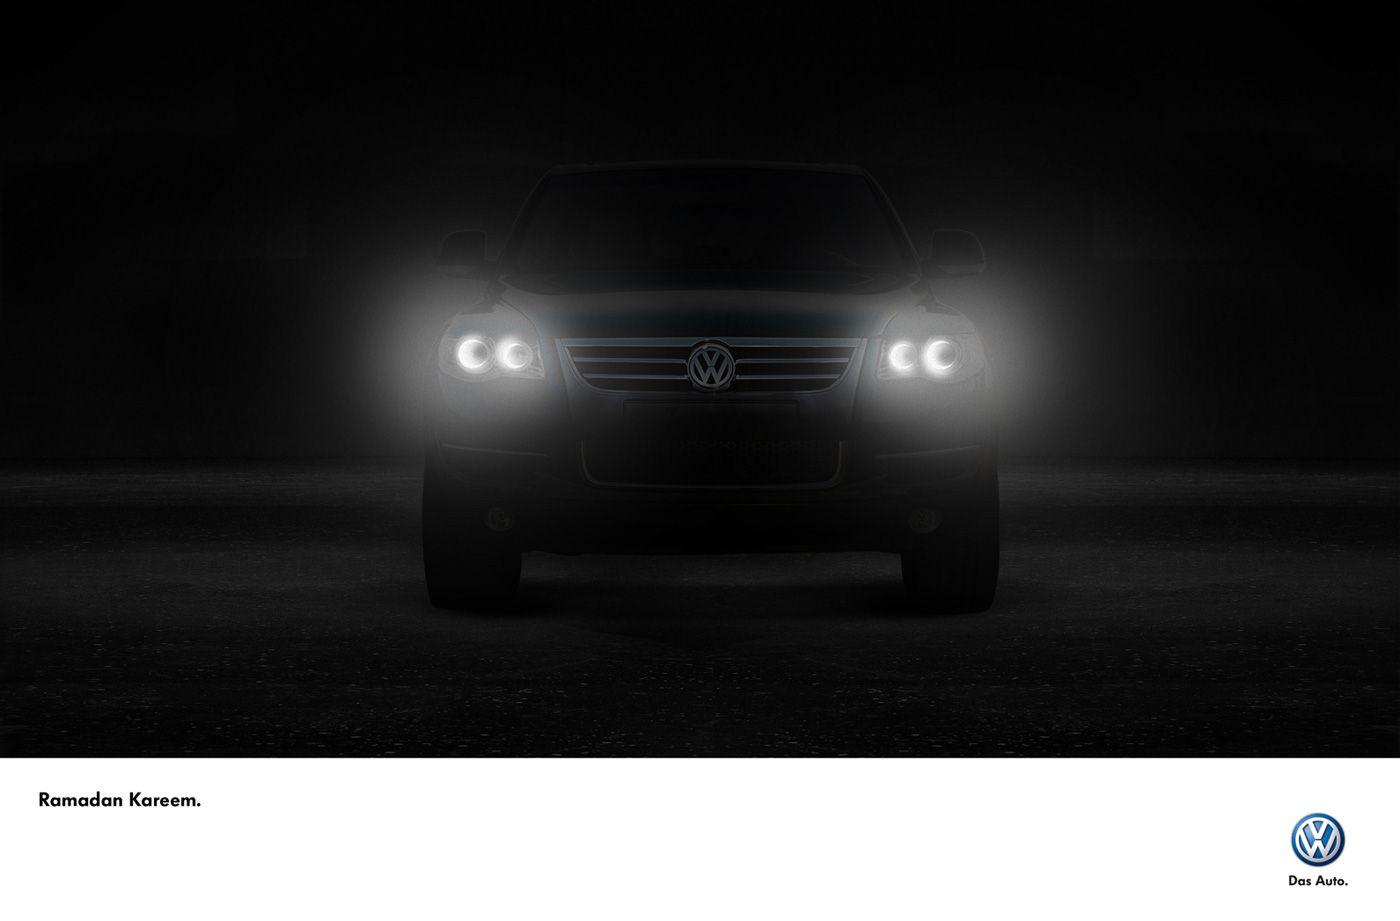 Subaru Qatar Ramadan Kareem Get Attractive Payment Facebook